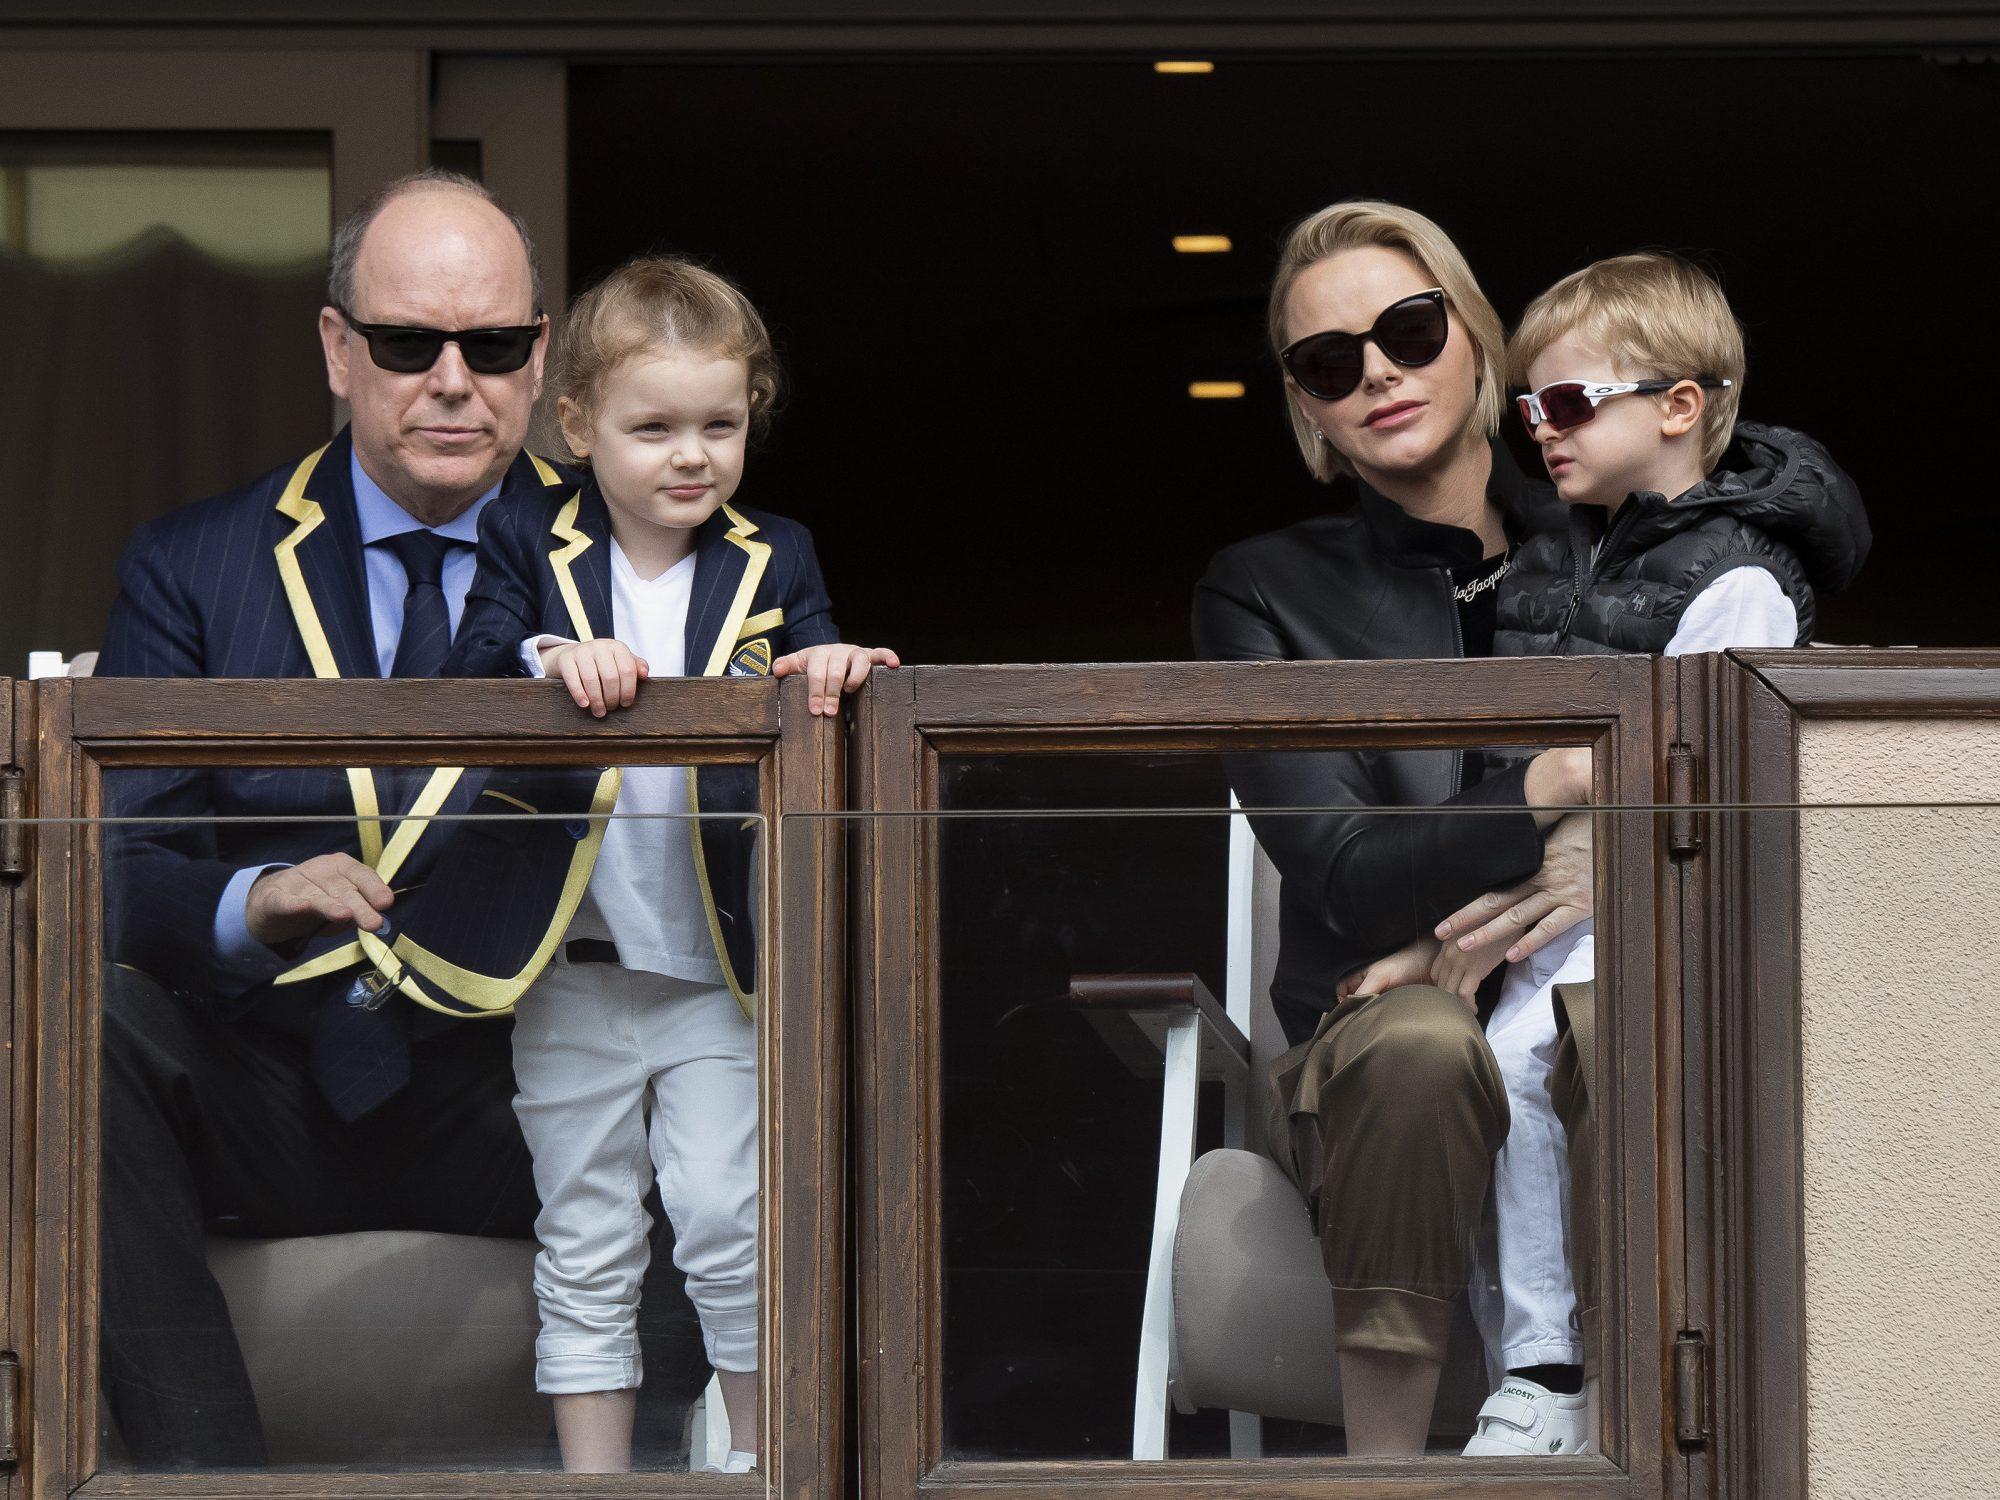 principe Alberto y princesa charlene principe Jacques Honoré Rainier princesa Gabriella Therese Marie de MOnaco